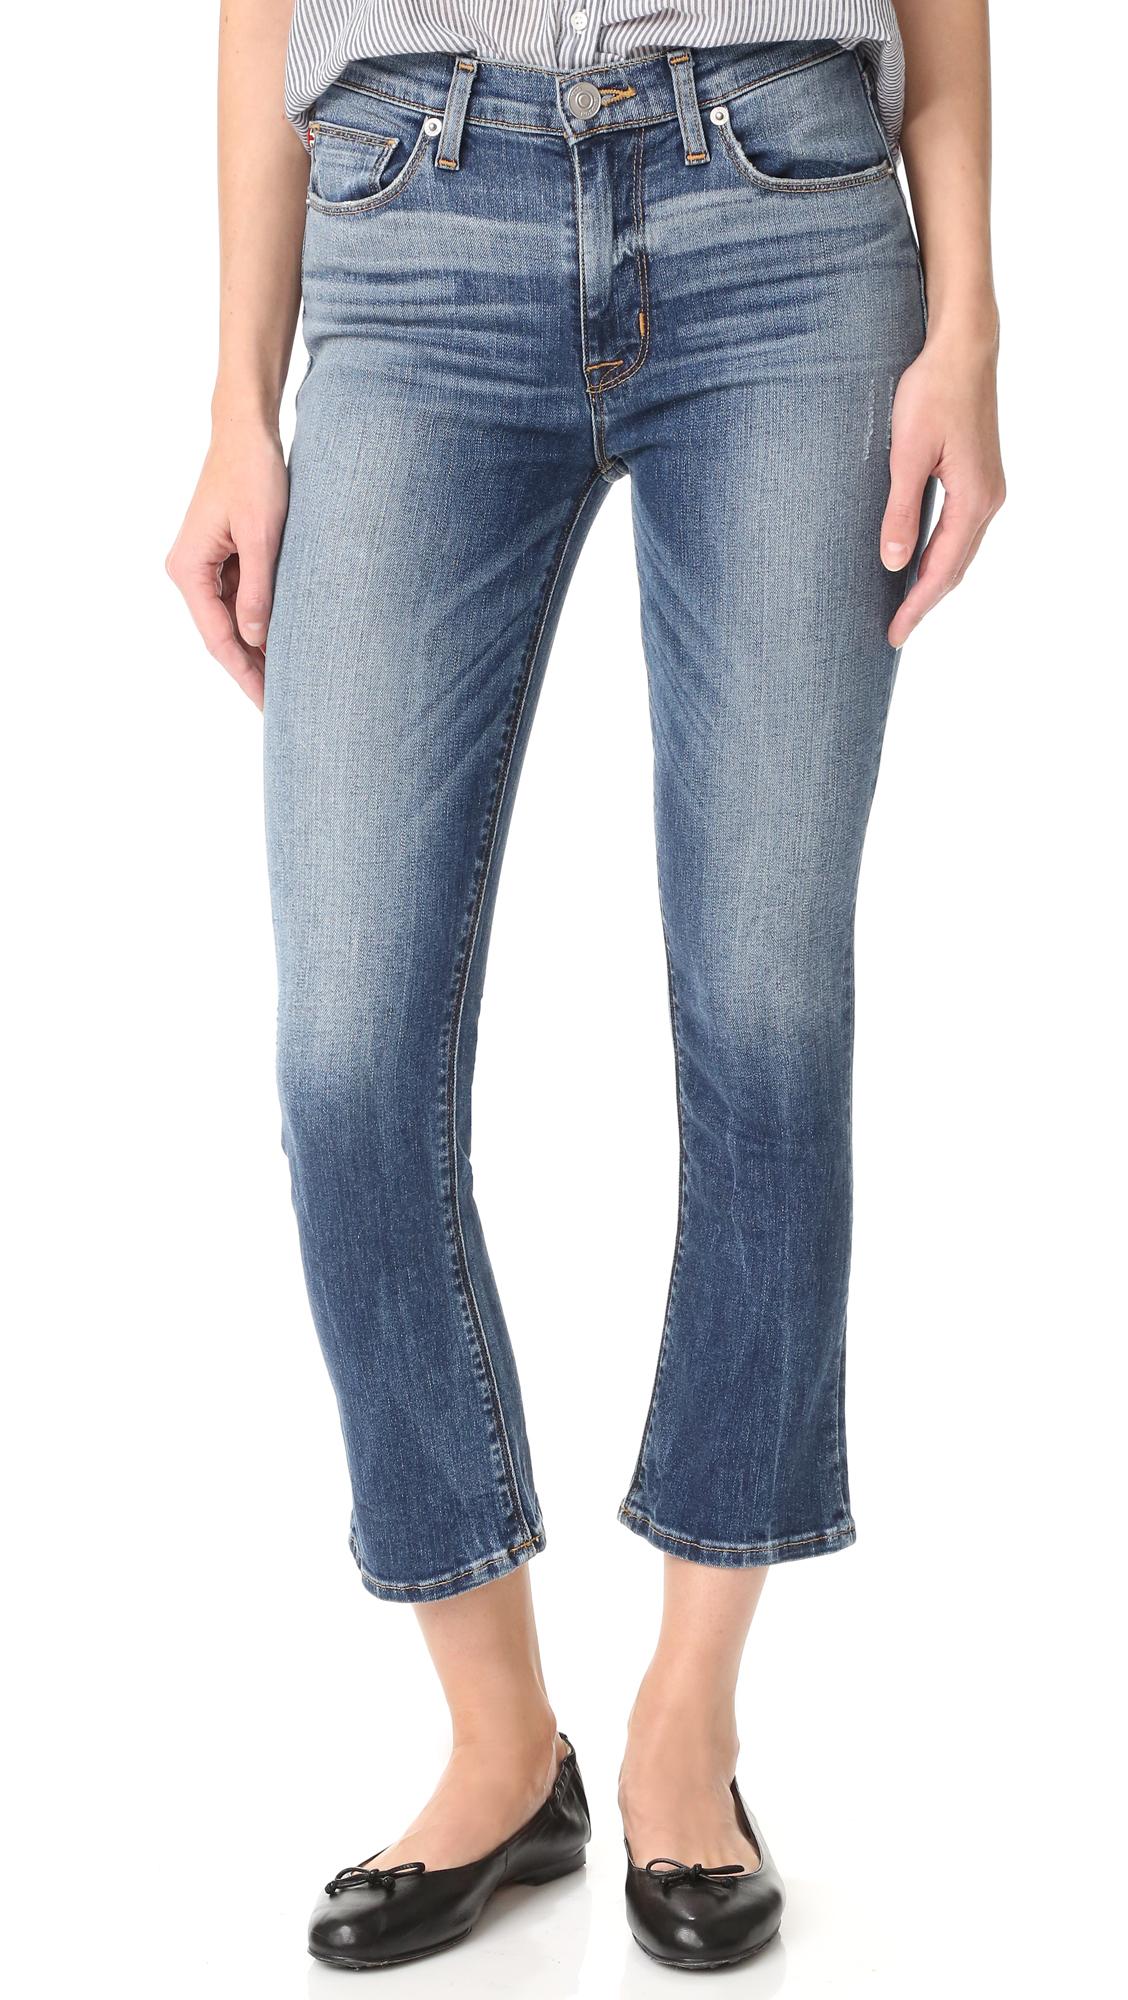 Hudson Harper High Rise Cropped Jeans - Life Line at Shopbop